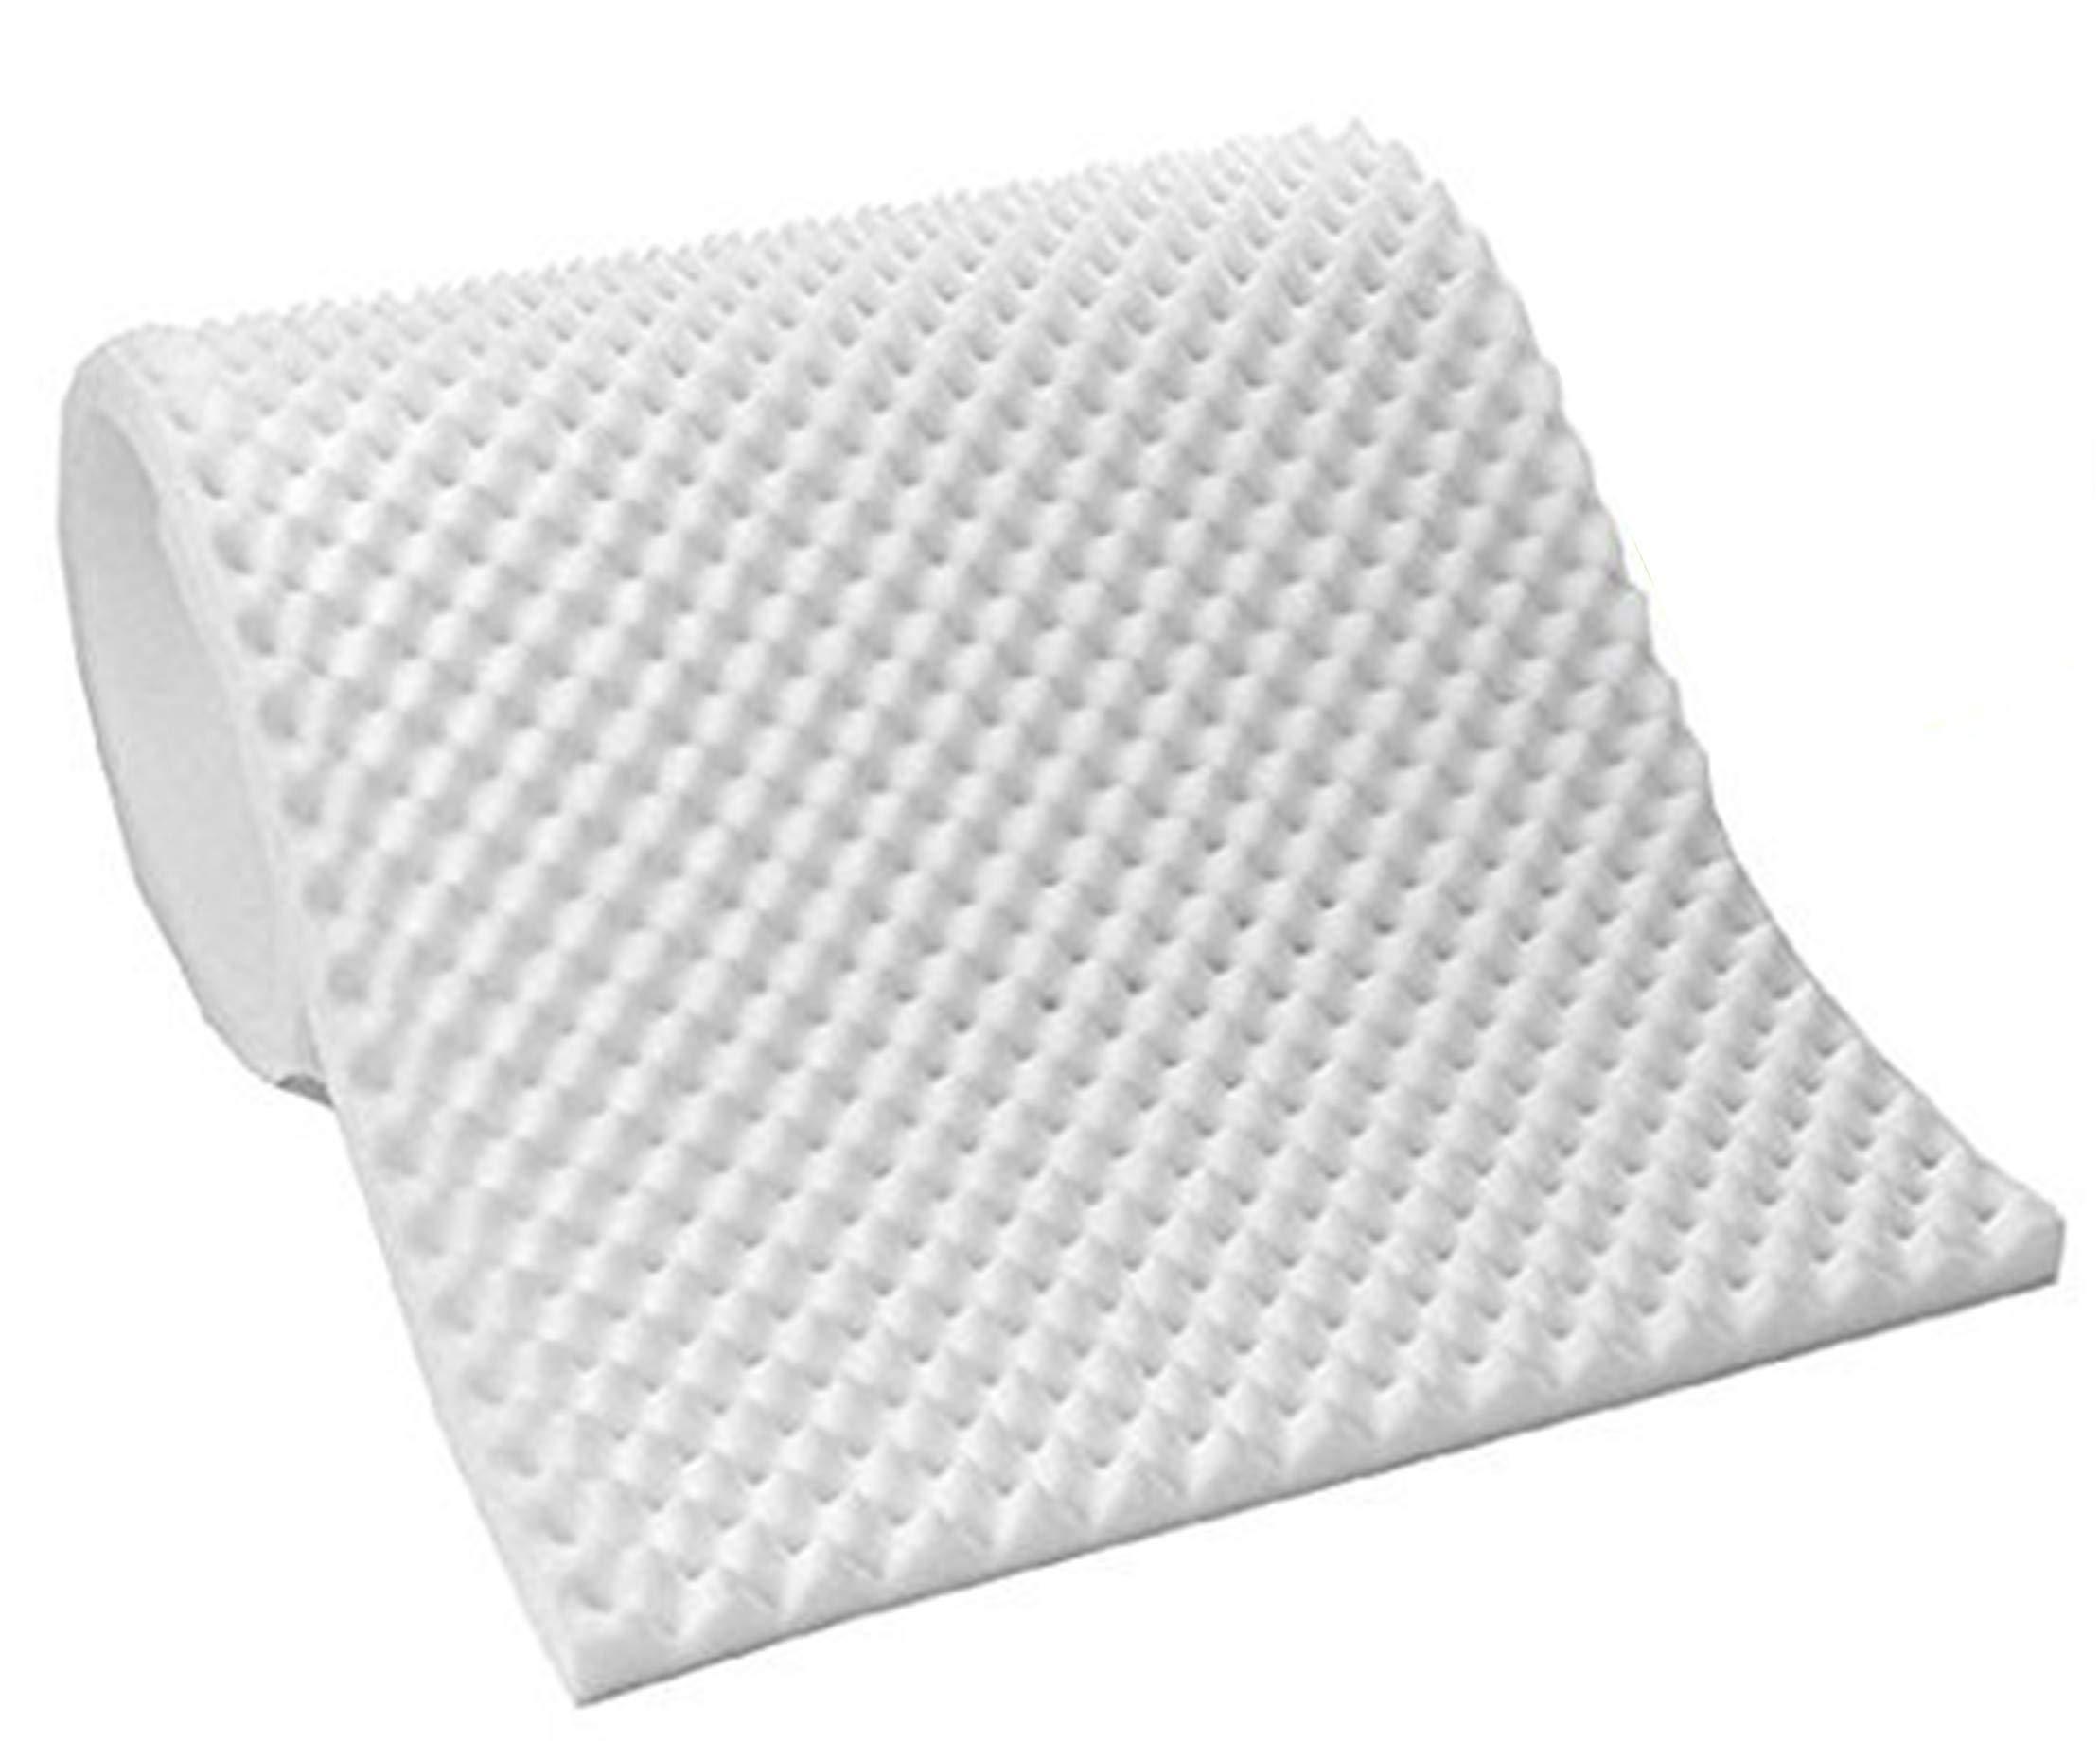 Vaunn Medical Premium White Egg Crate Convoluted Foam Mattress Pad Topper Hospital Bed Twin Size by Vaunn